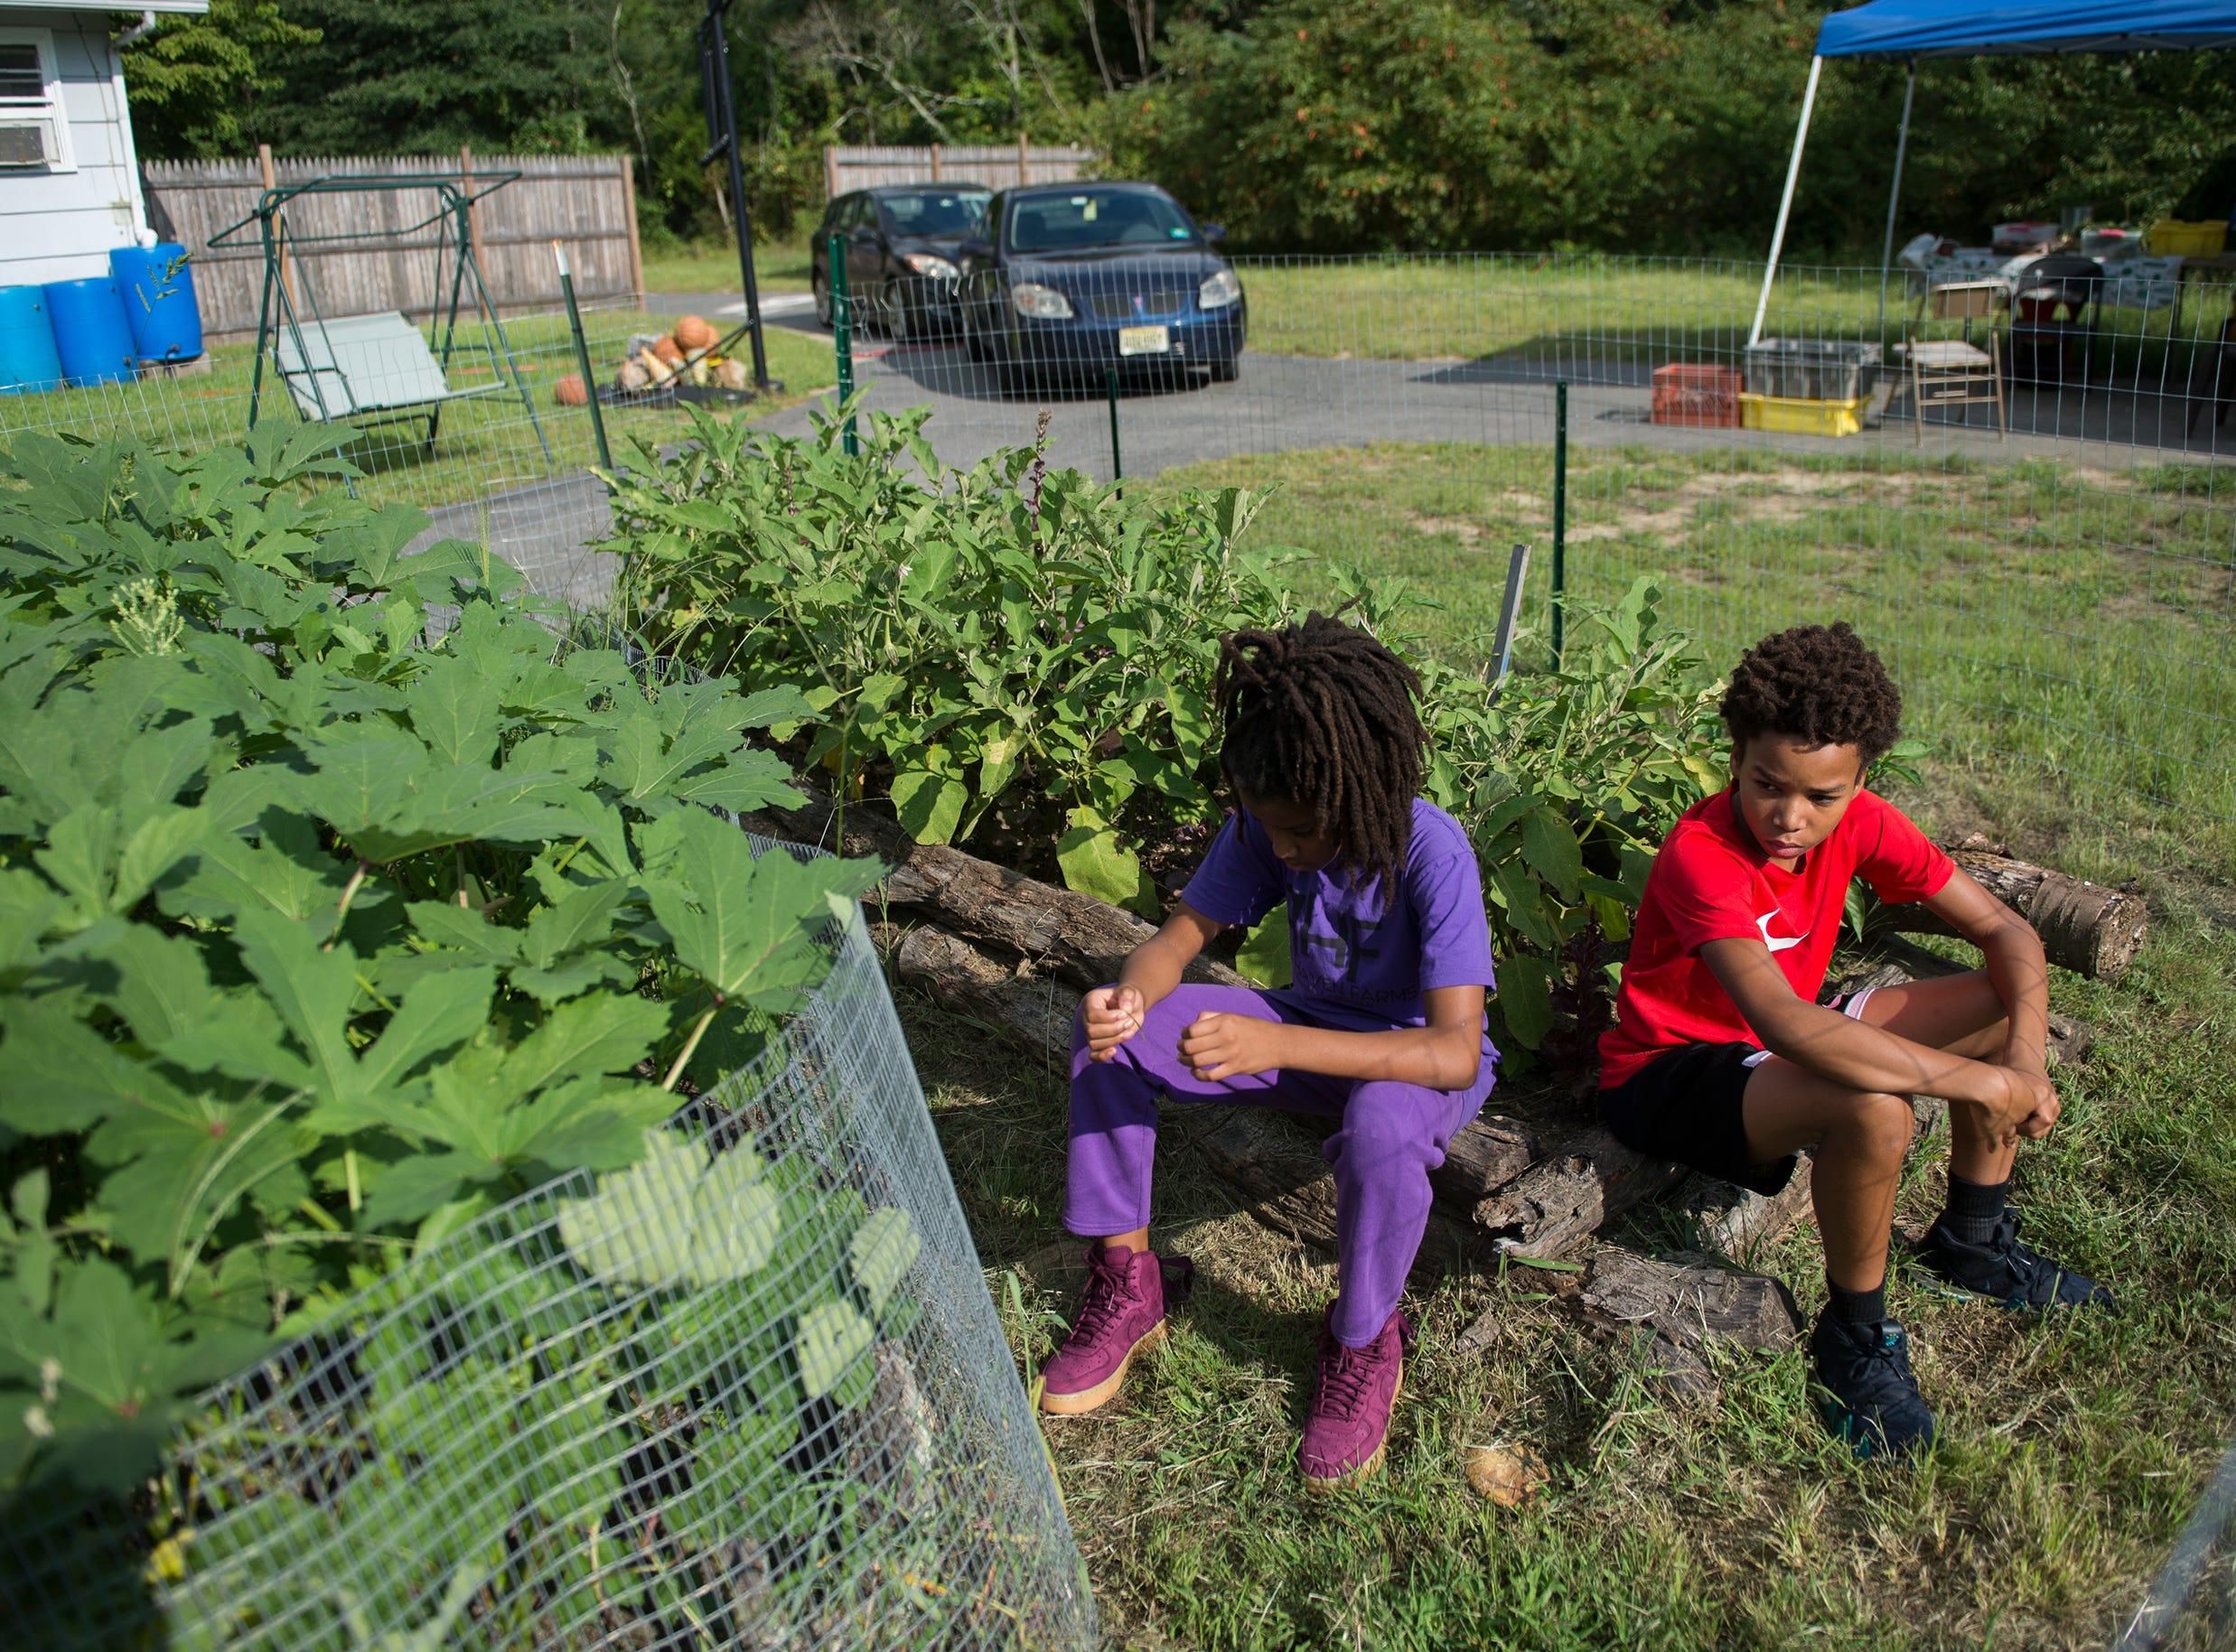 Adia Hall, 10, left, and Sitafa Hall, 12, at their family's farm Thursday, Aug. 23, 2018 in Lawnside, N.J.